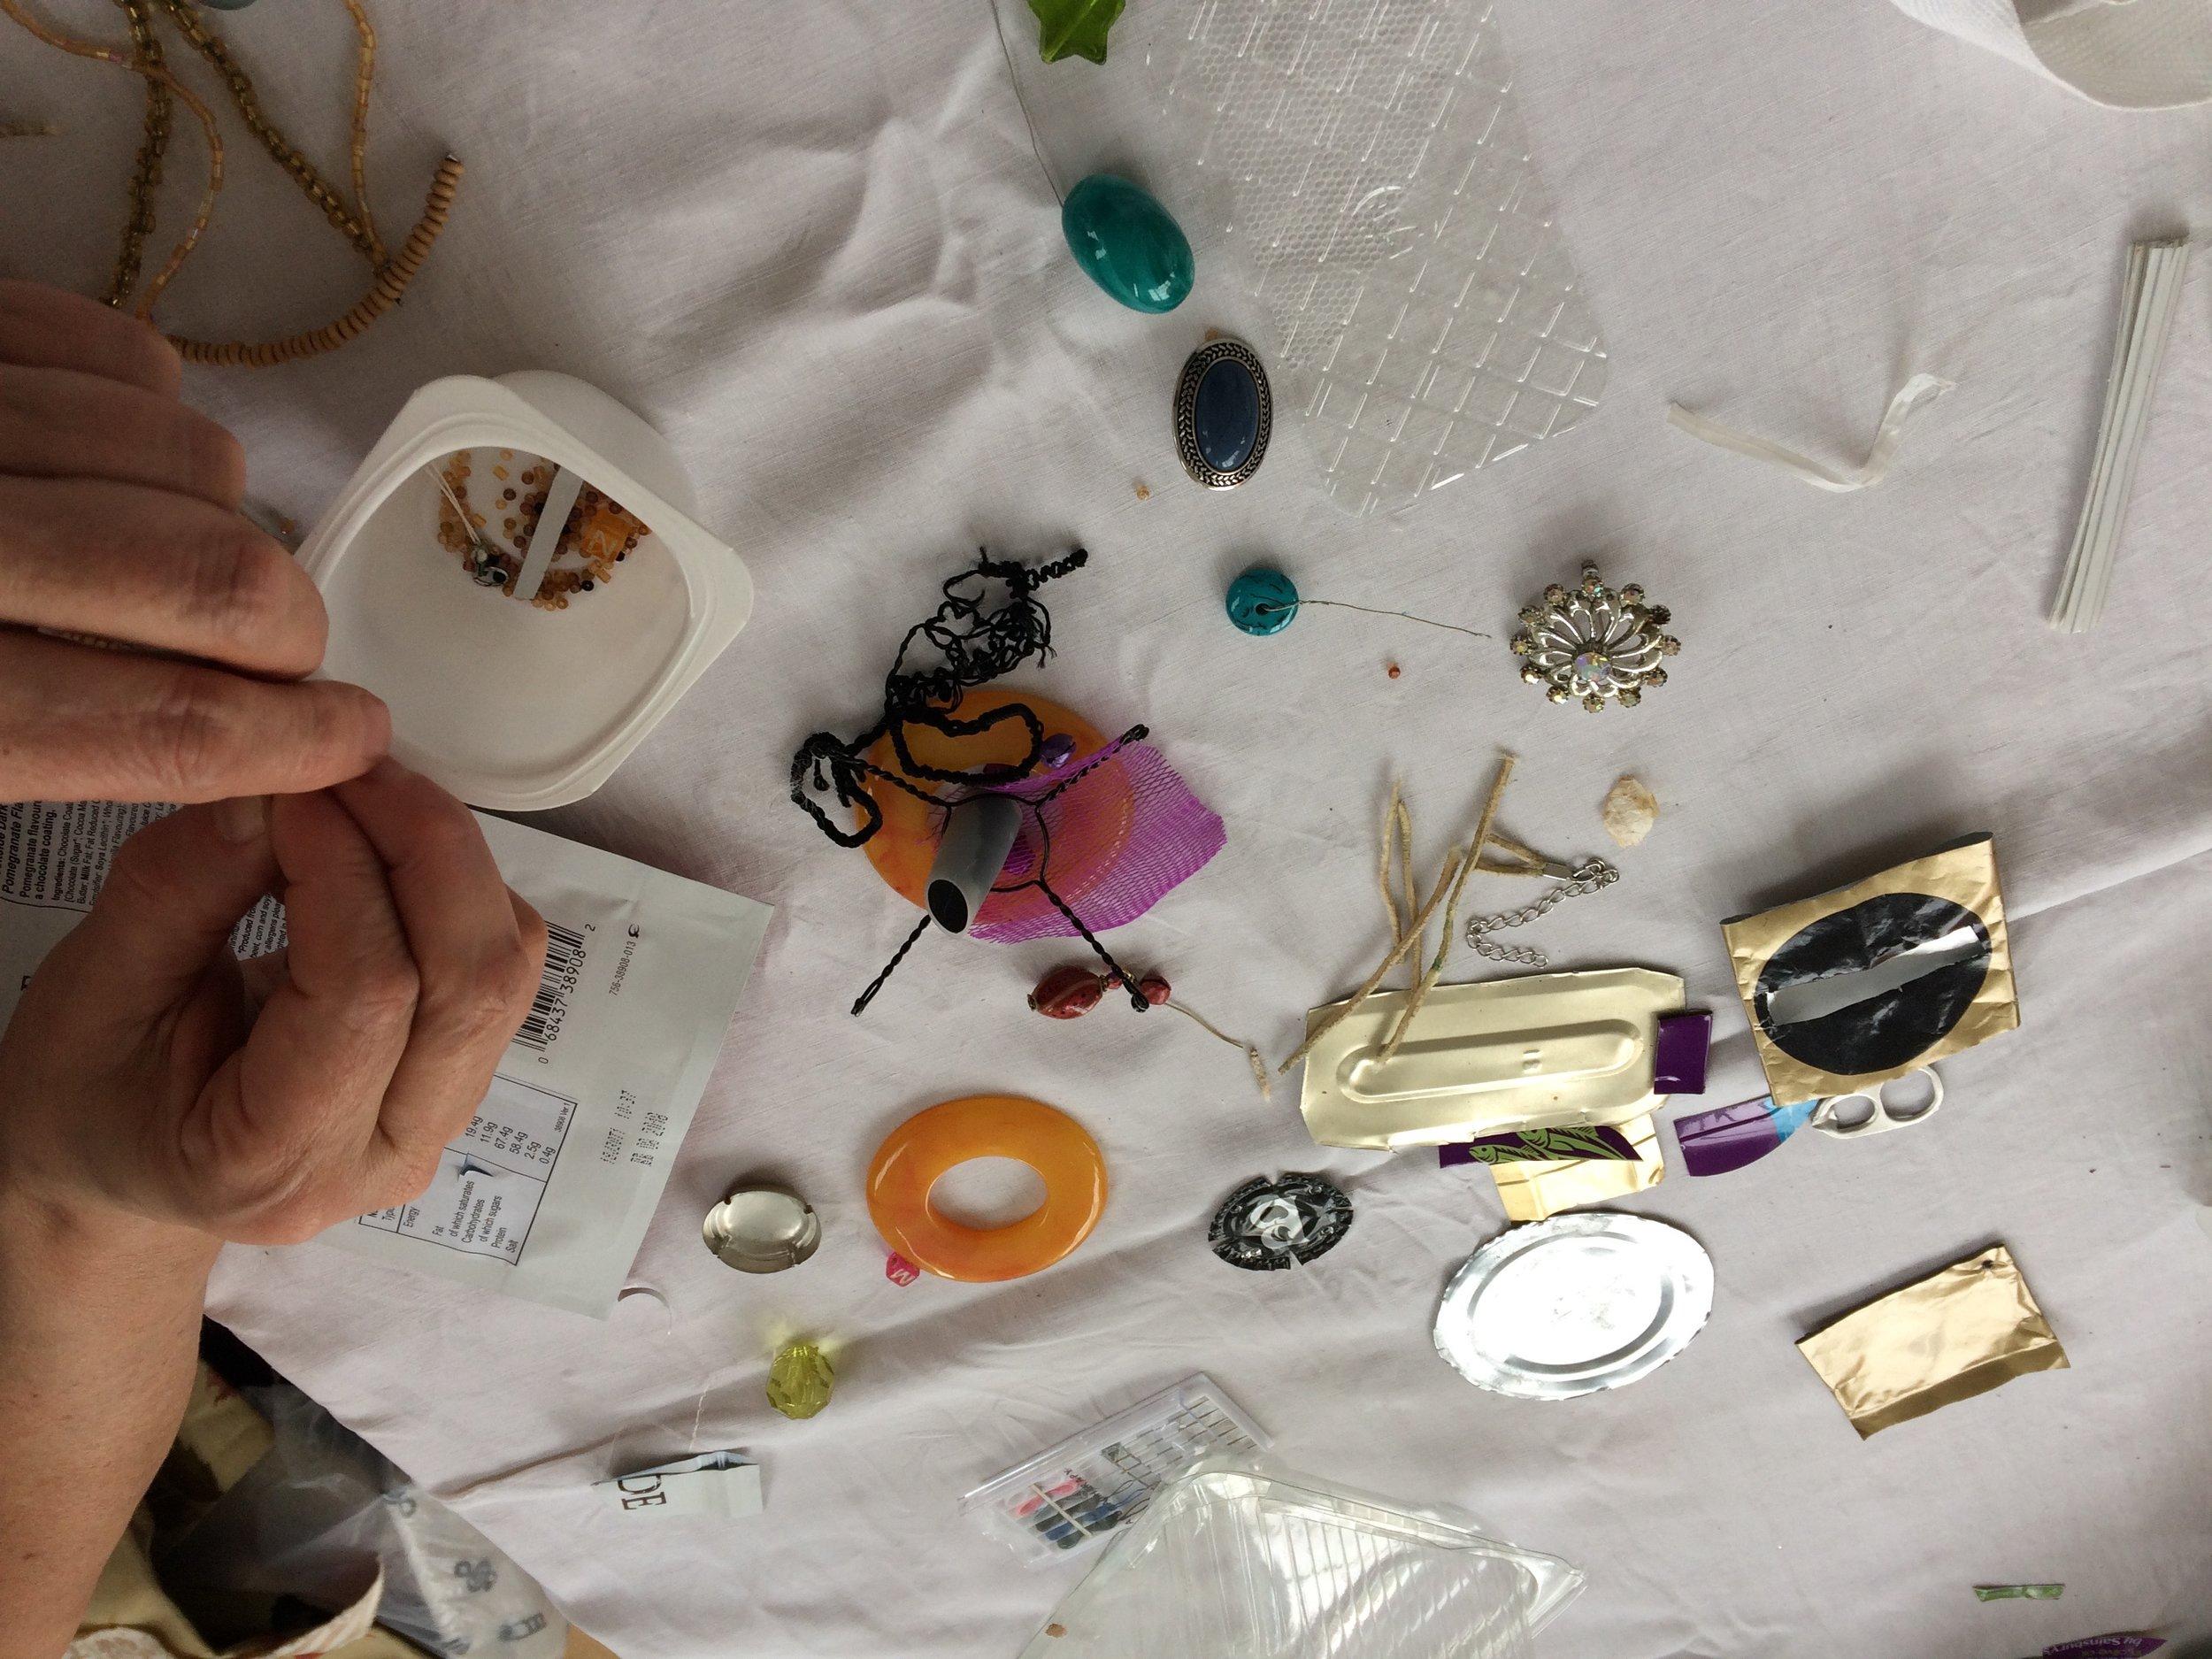 Experimeting with plastics as art materials